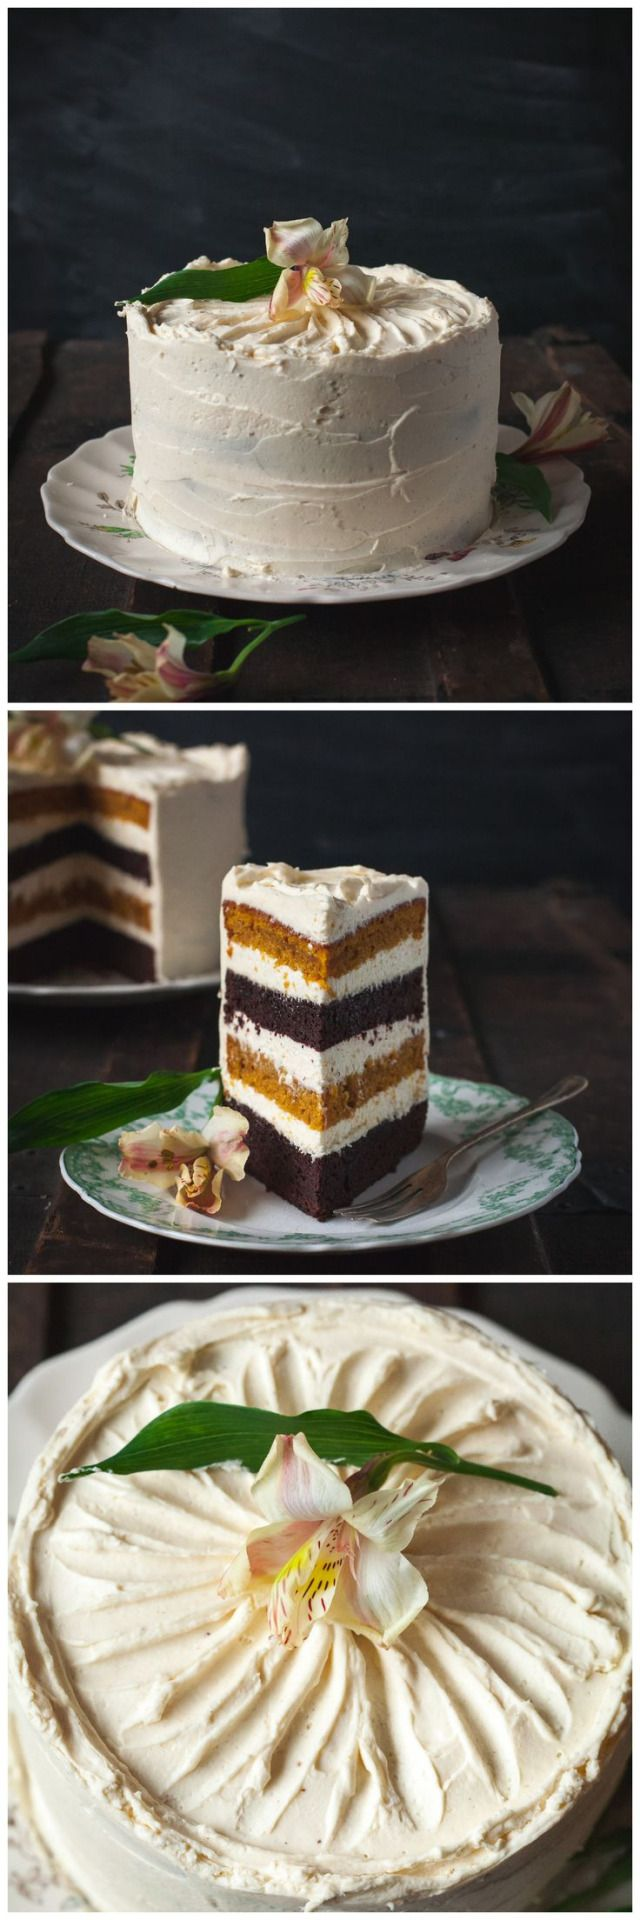 IvyCorrêa. Spiced pumpkin and chocolate cake with maple cinnaon mascarpone frosting. vikalinka.com